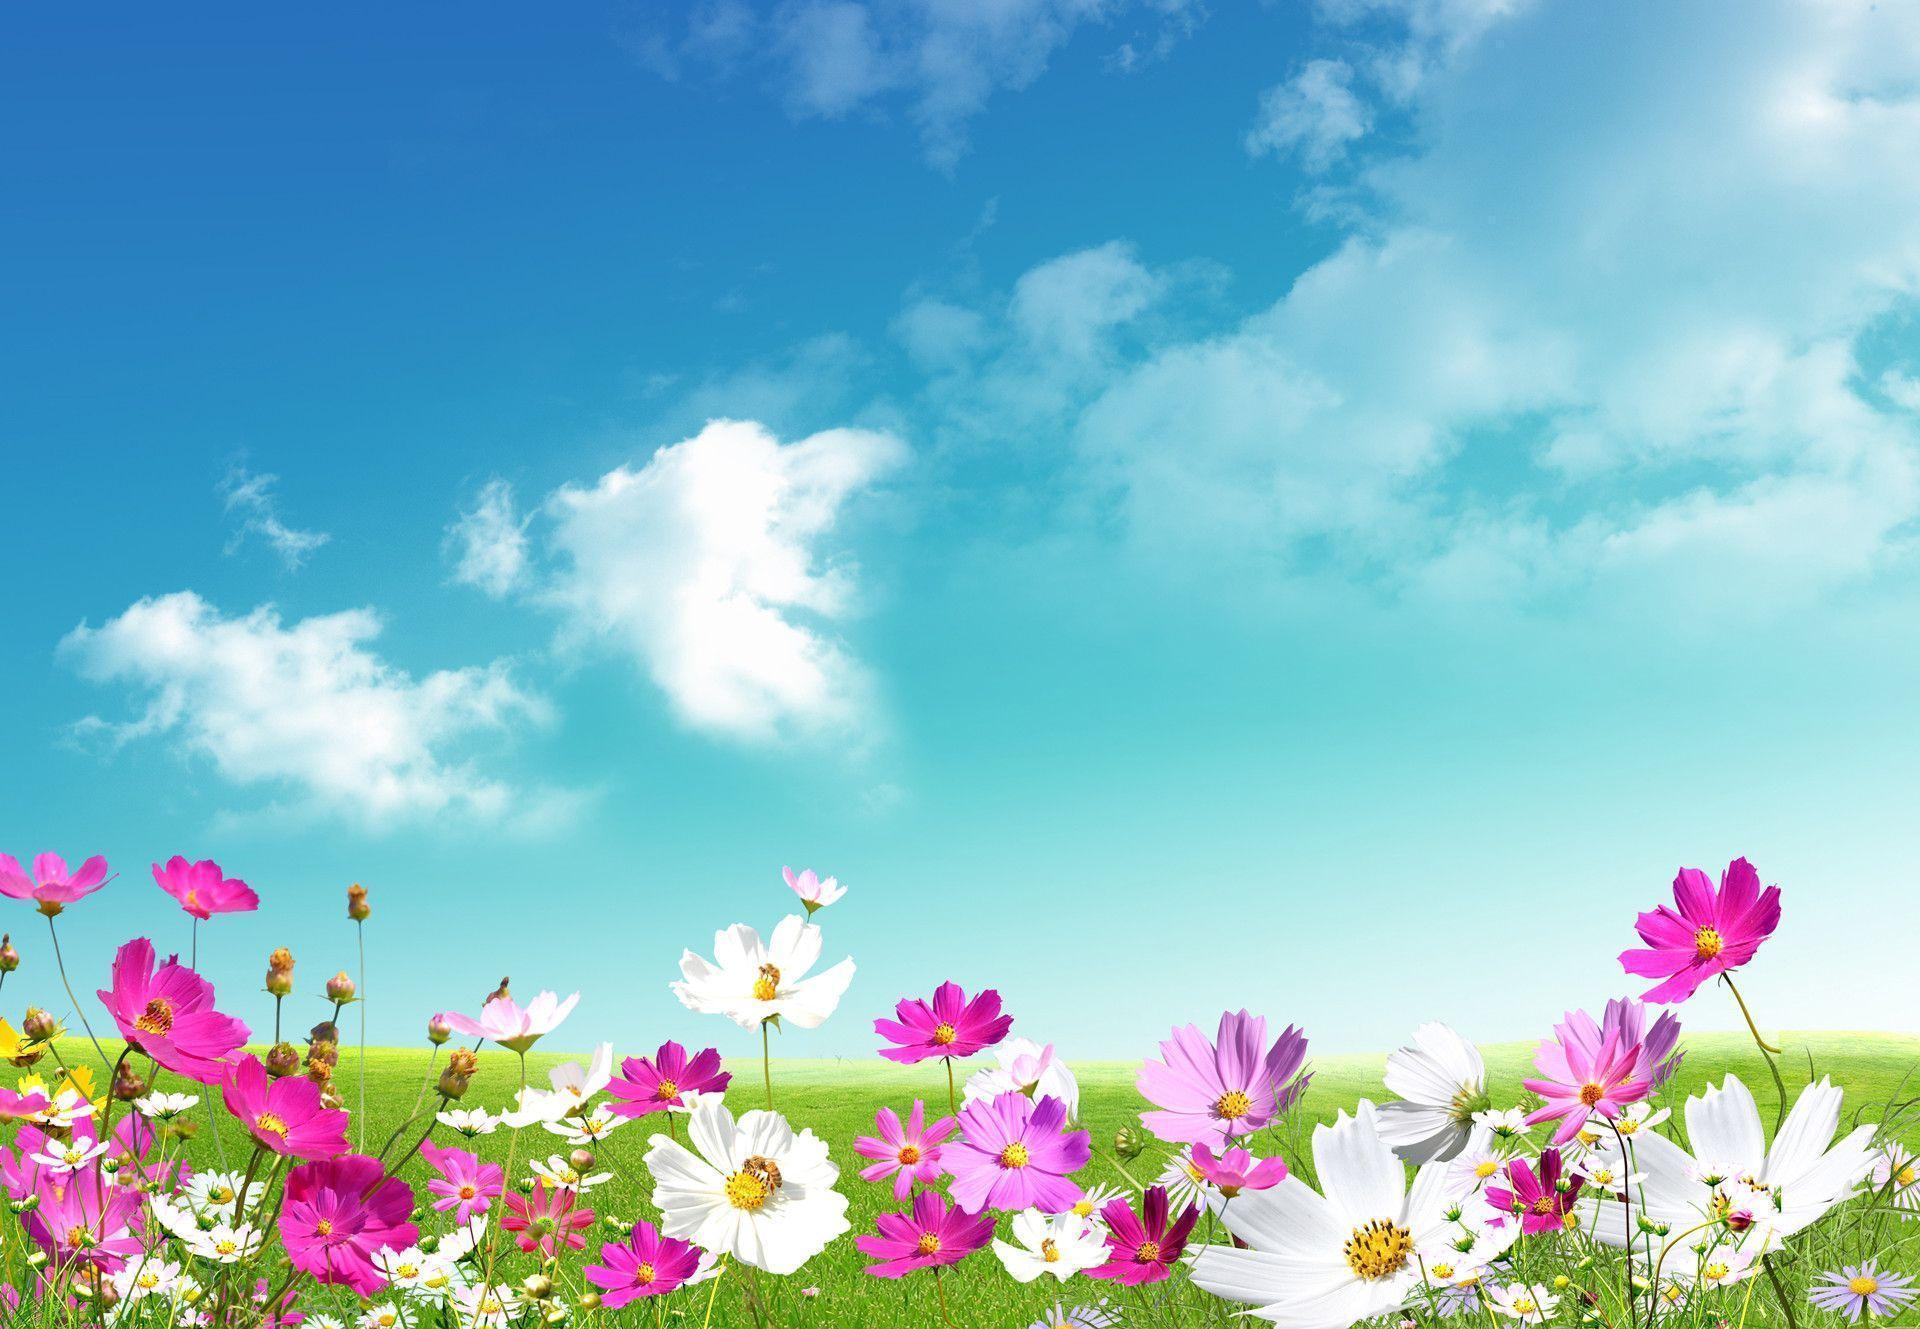 Spring Desktop Wallpaper Backgrounds 1920x1329